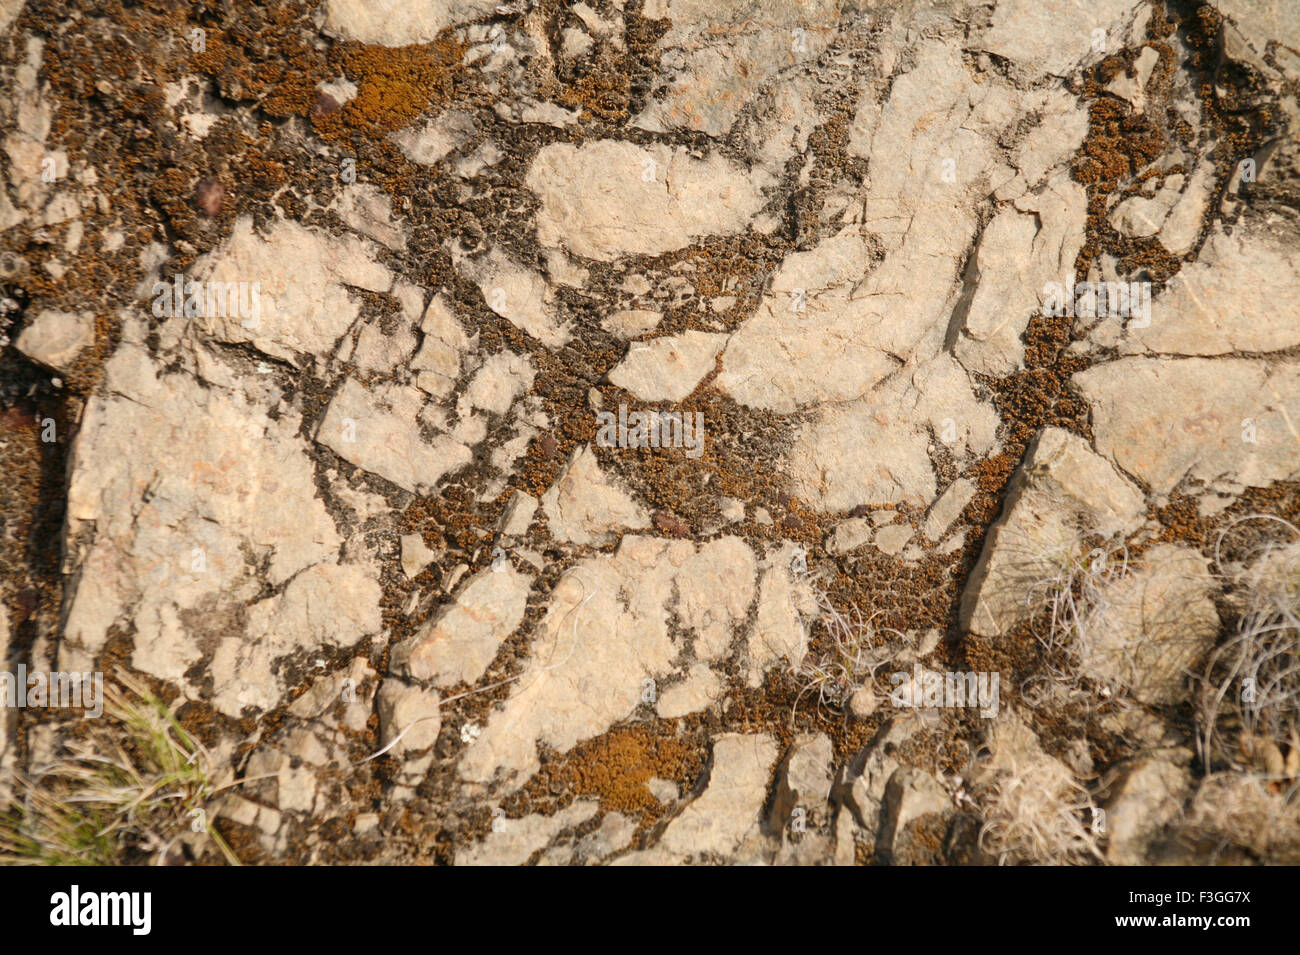 Abstract visual confusione pietre ; Himalaya ; Nagthat ; Uttaranchal ; India Immagini Stock